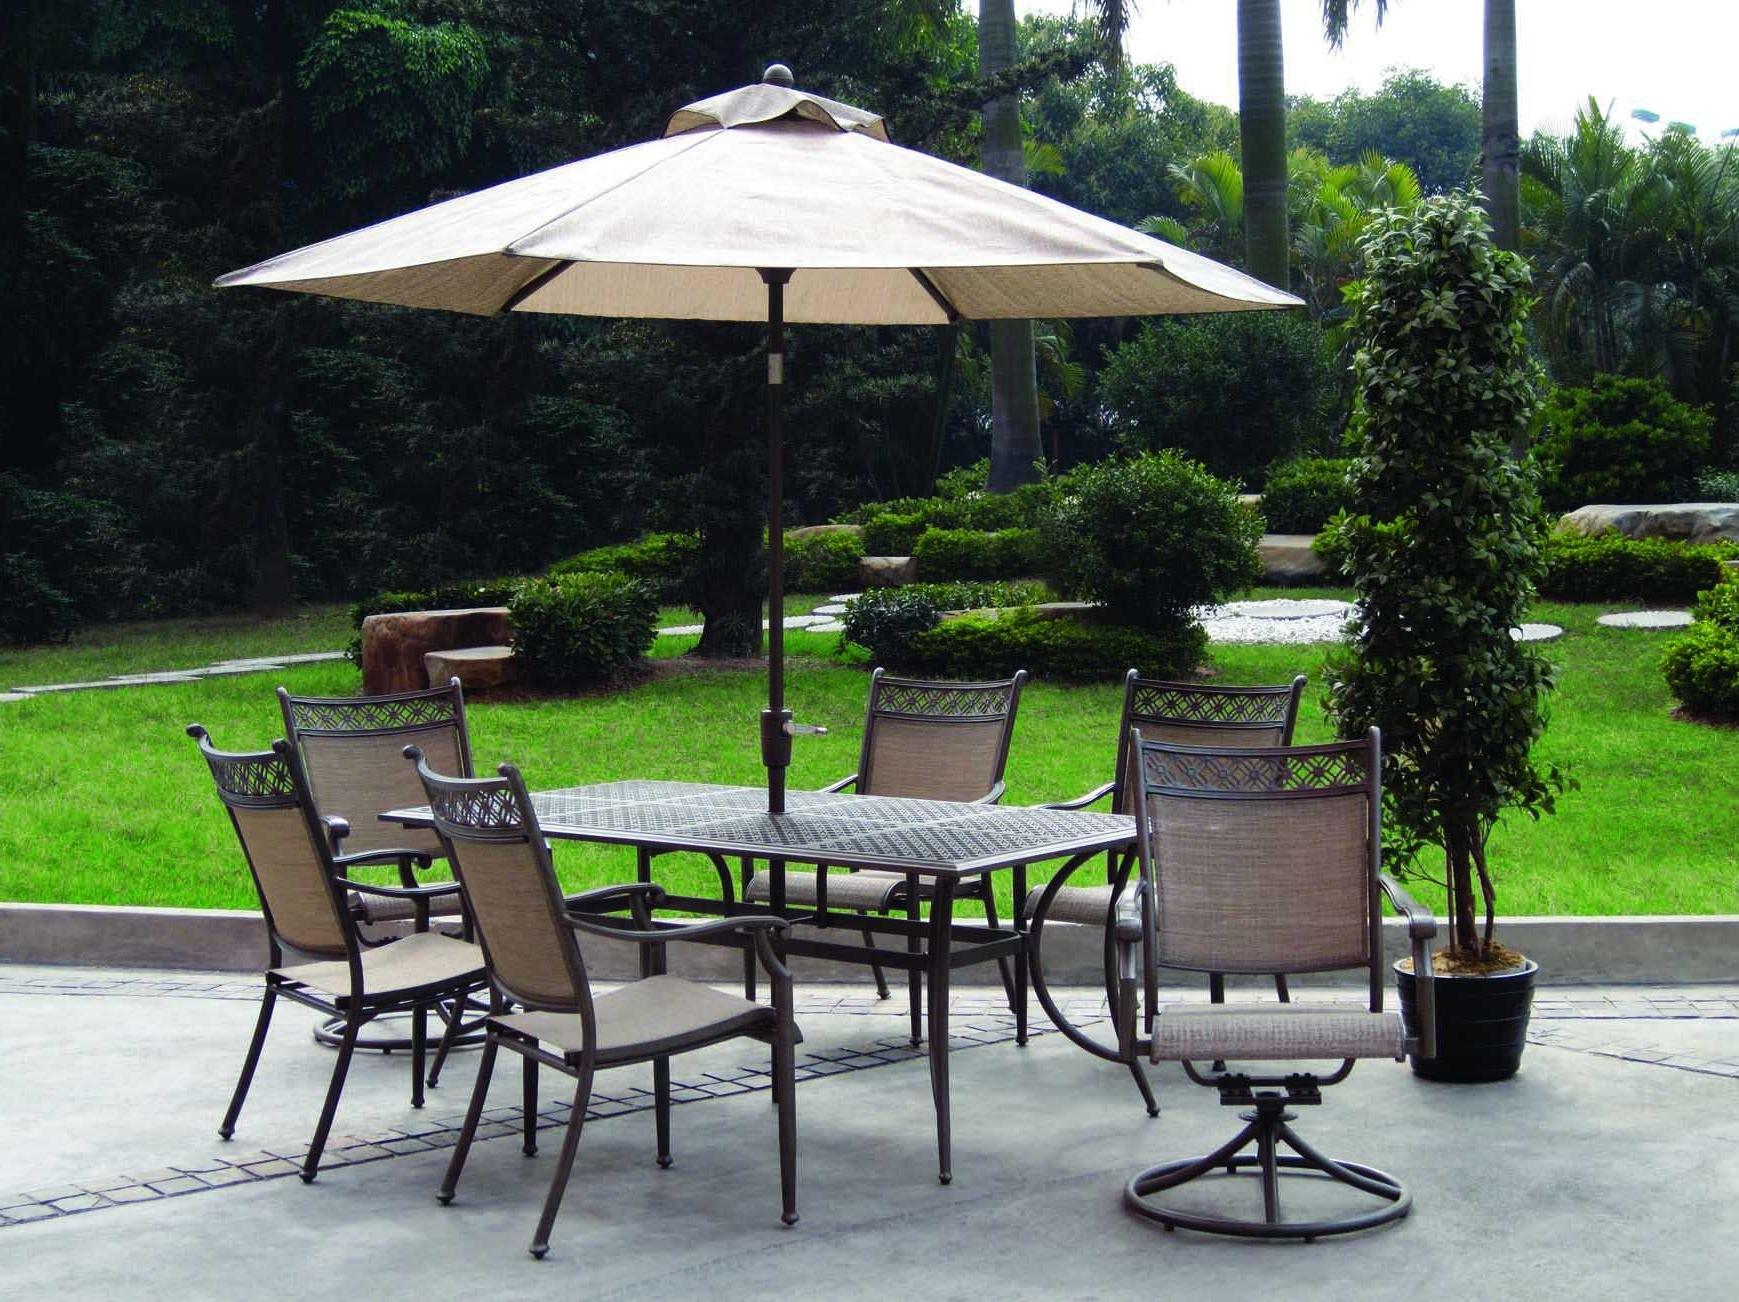 Favorite Enchanting Cheap Patio Umbrellas With Furniture Alluring Collection Regarding Sears Patio Umbrellas (View 6 of 20)